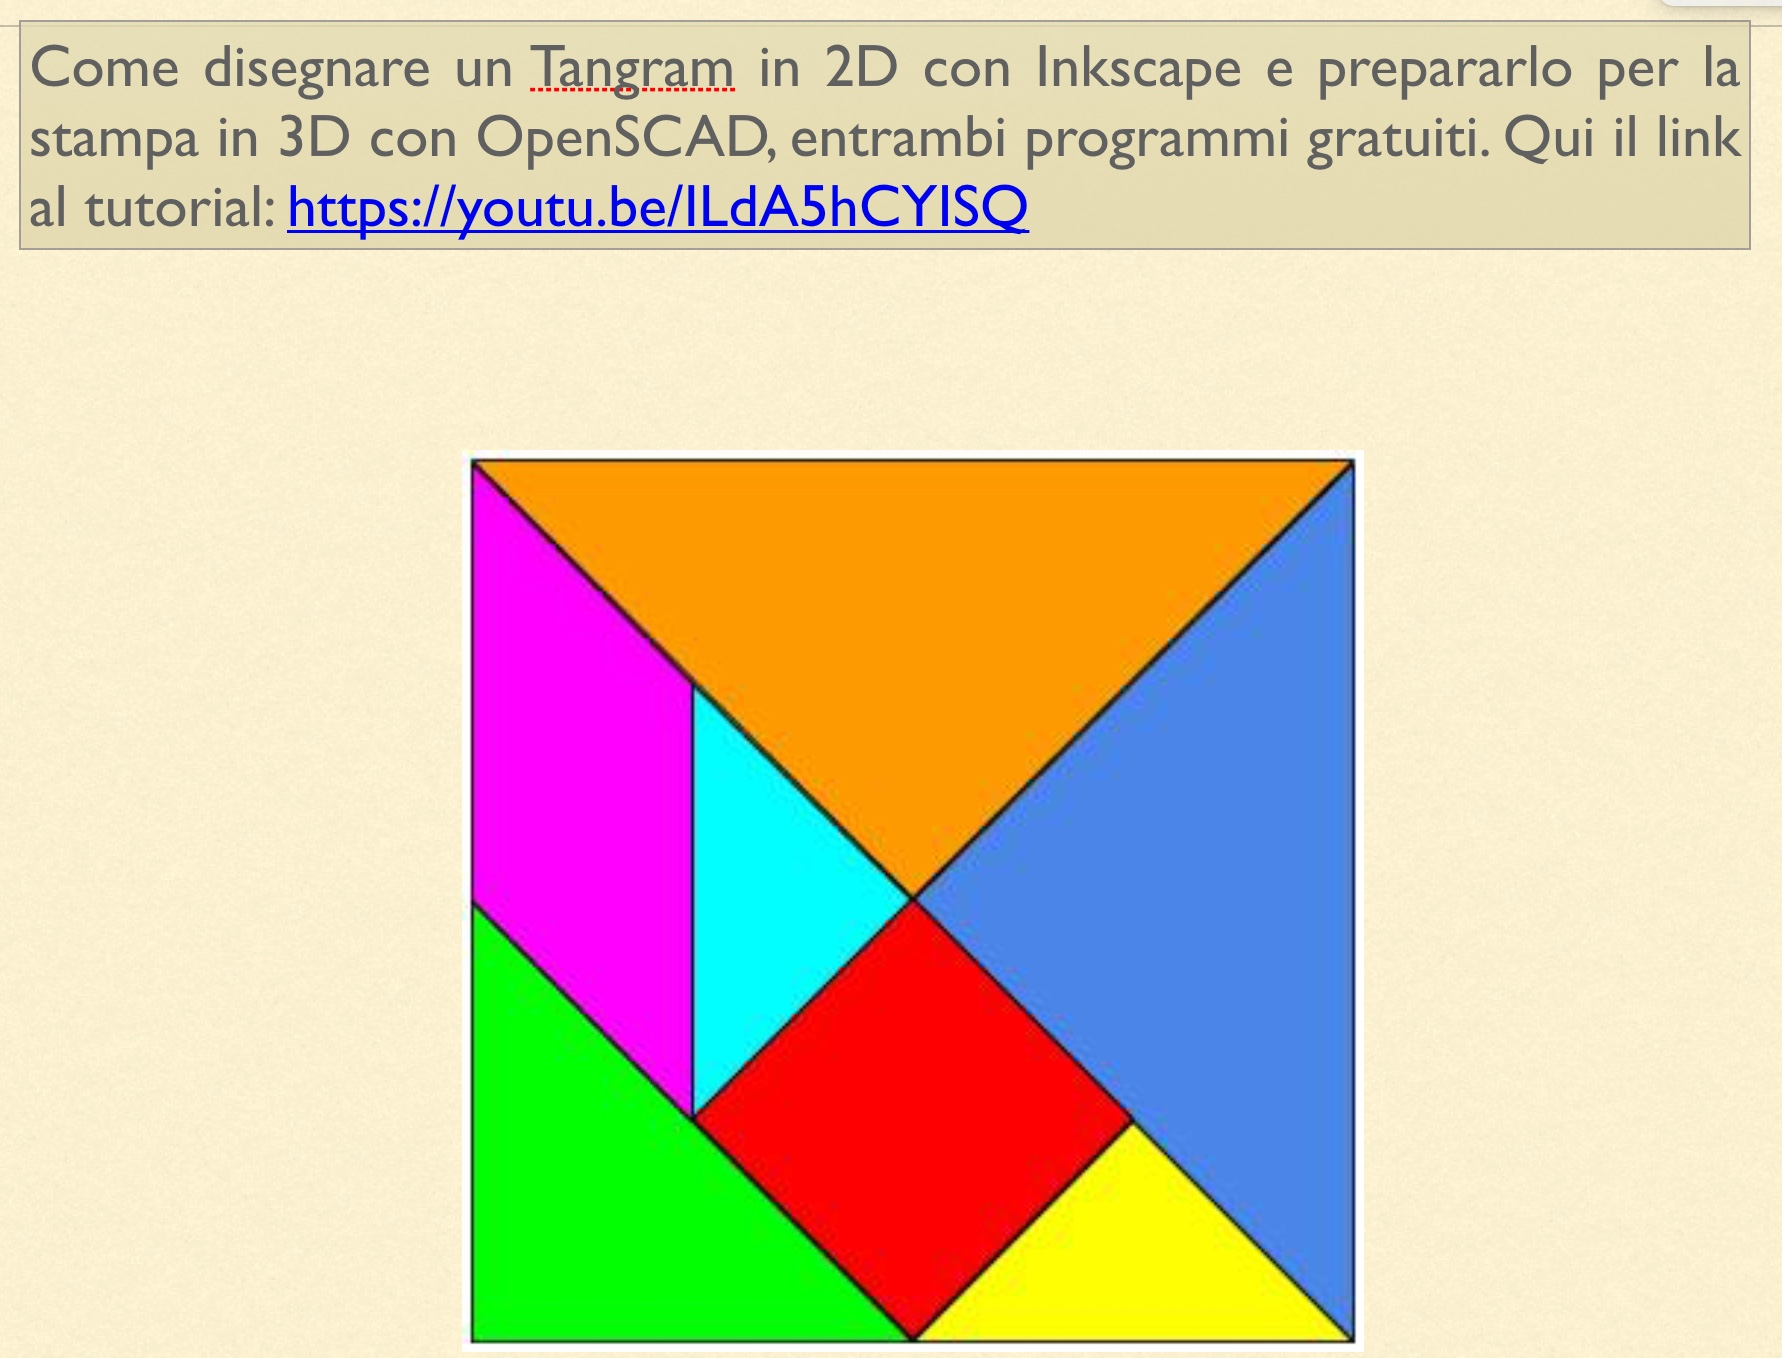 Costruzione del Tangram in 3D